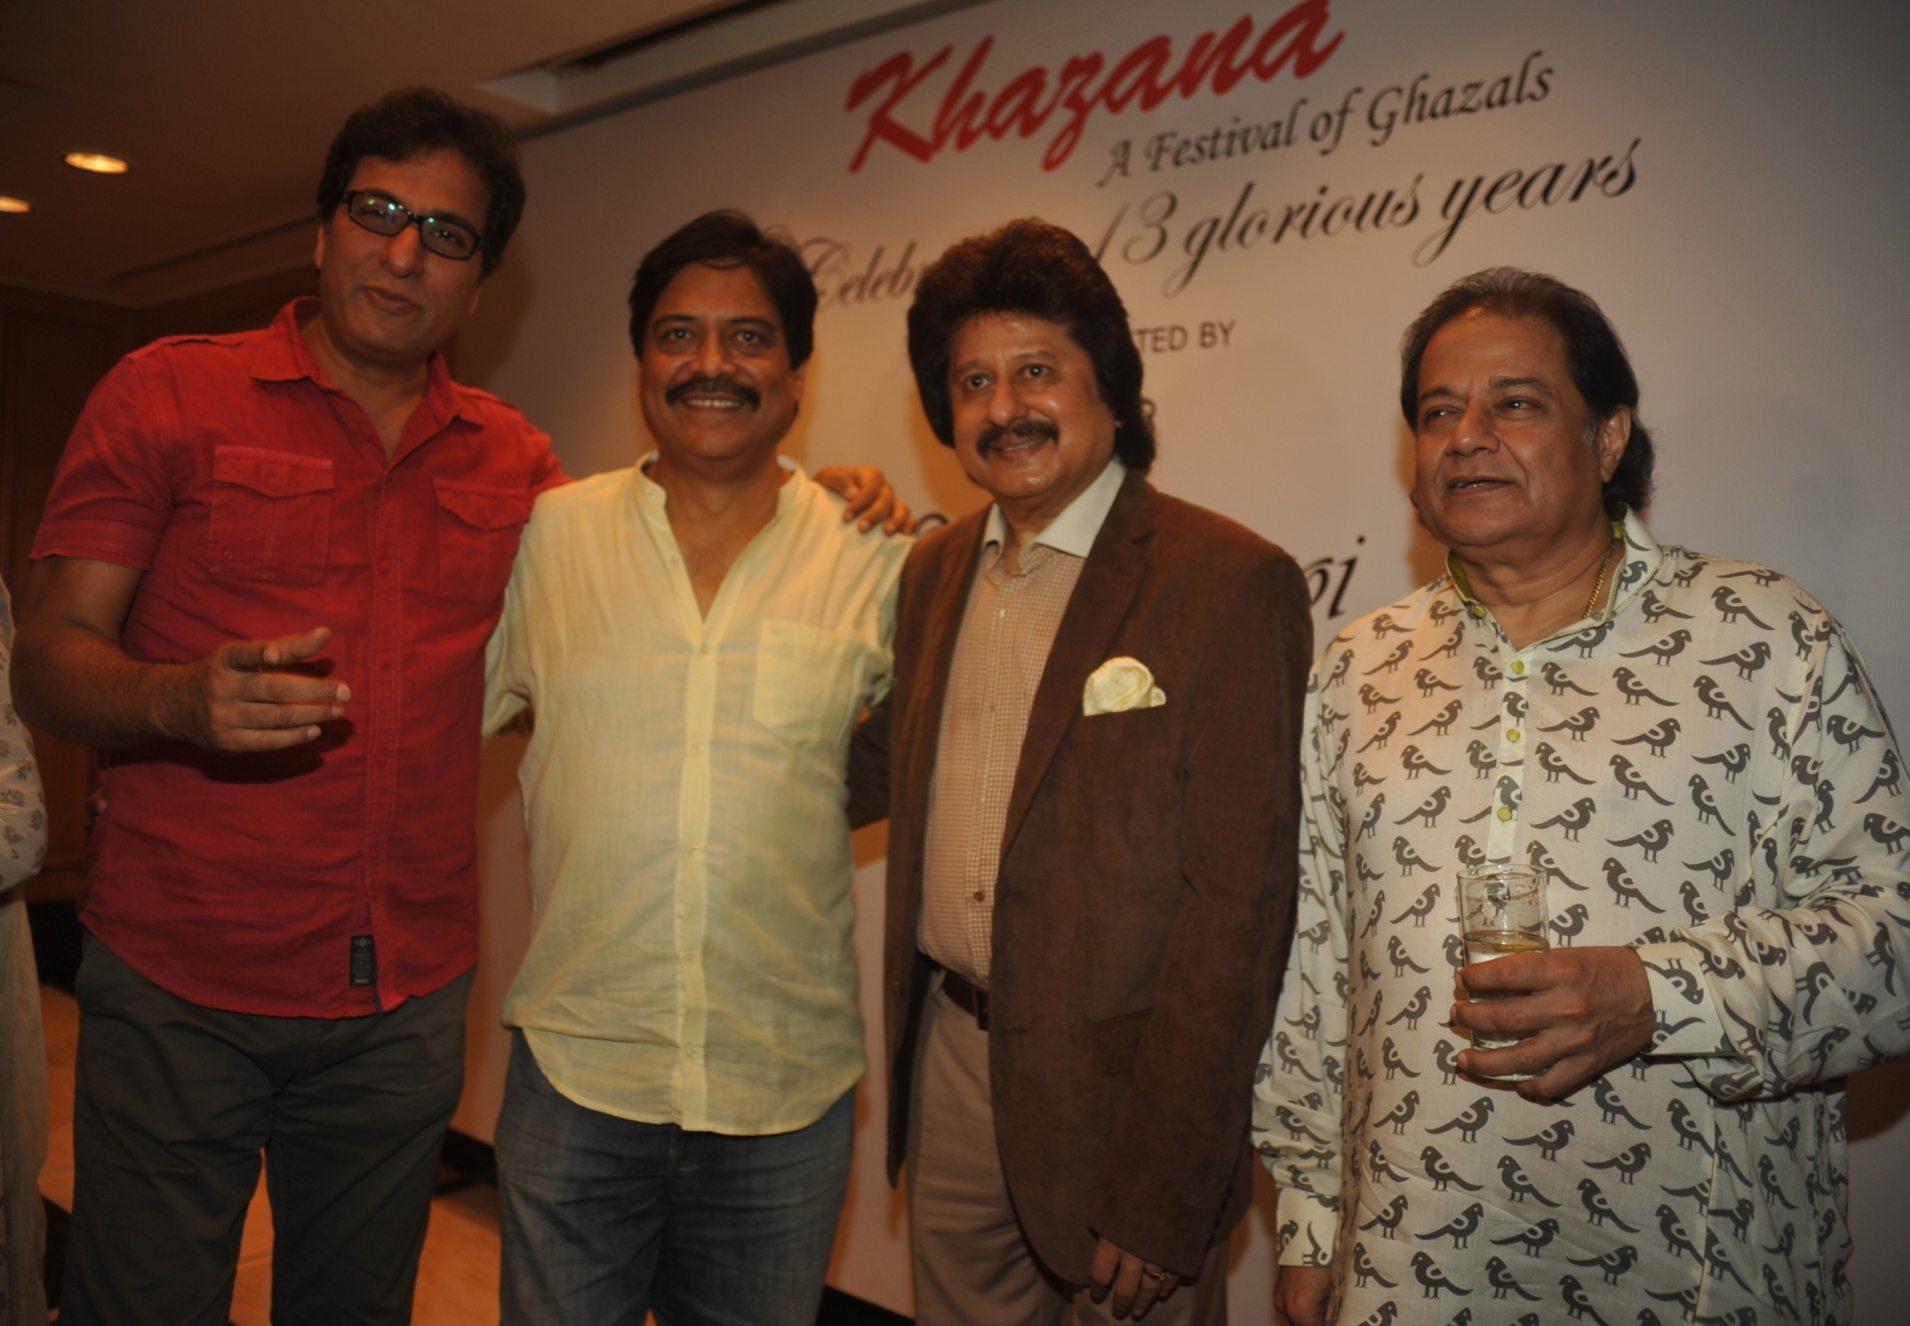 Festival of ghazals (2)